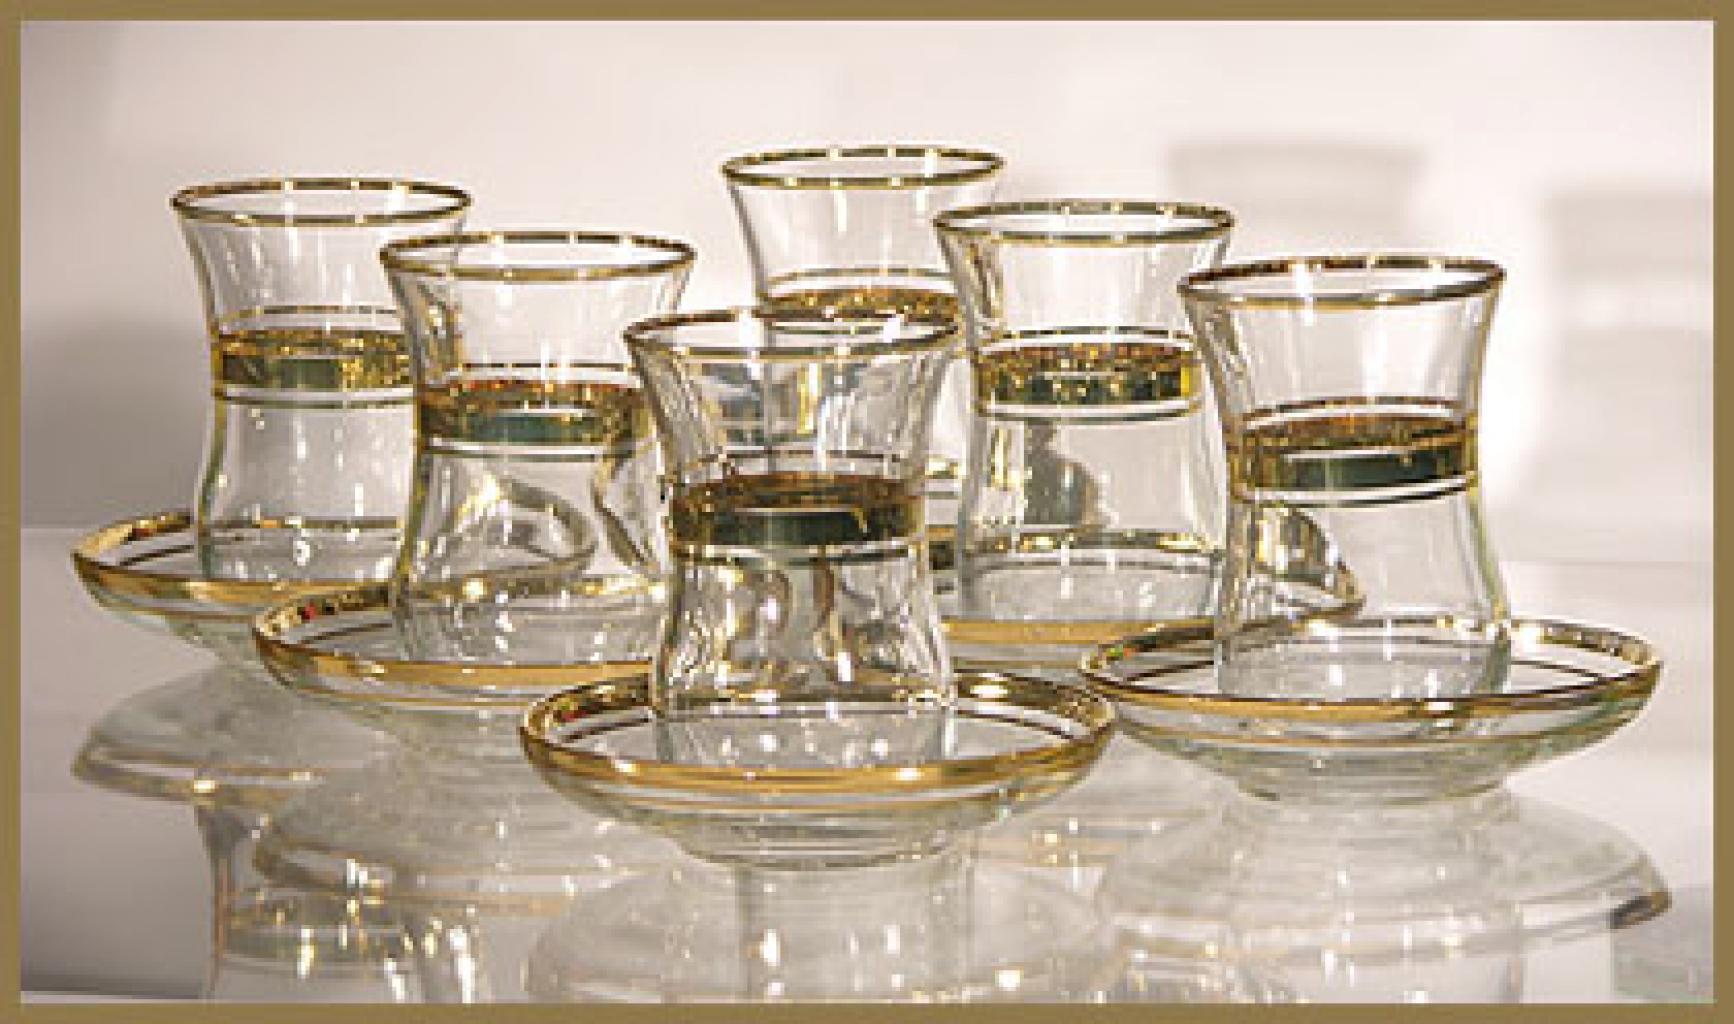 Arabian Tea Set with Gold Trim gi312